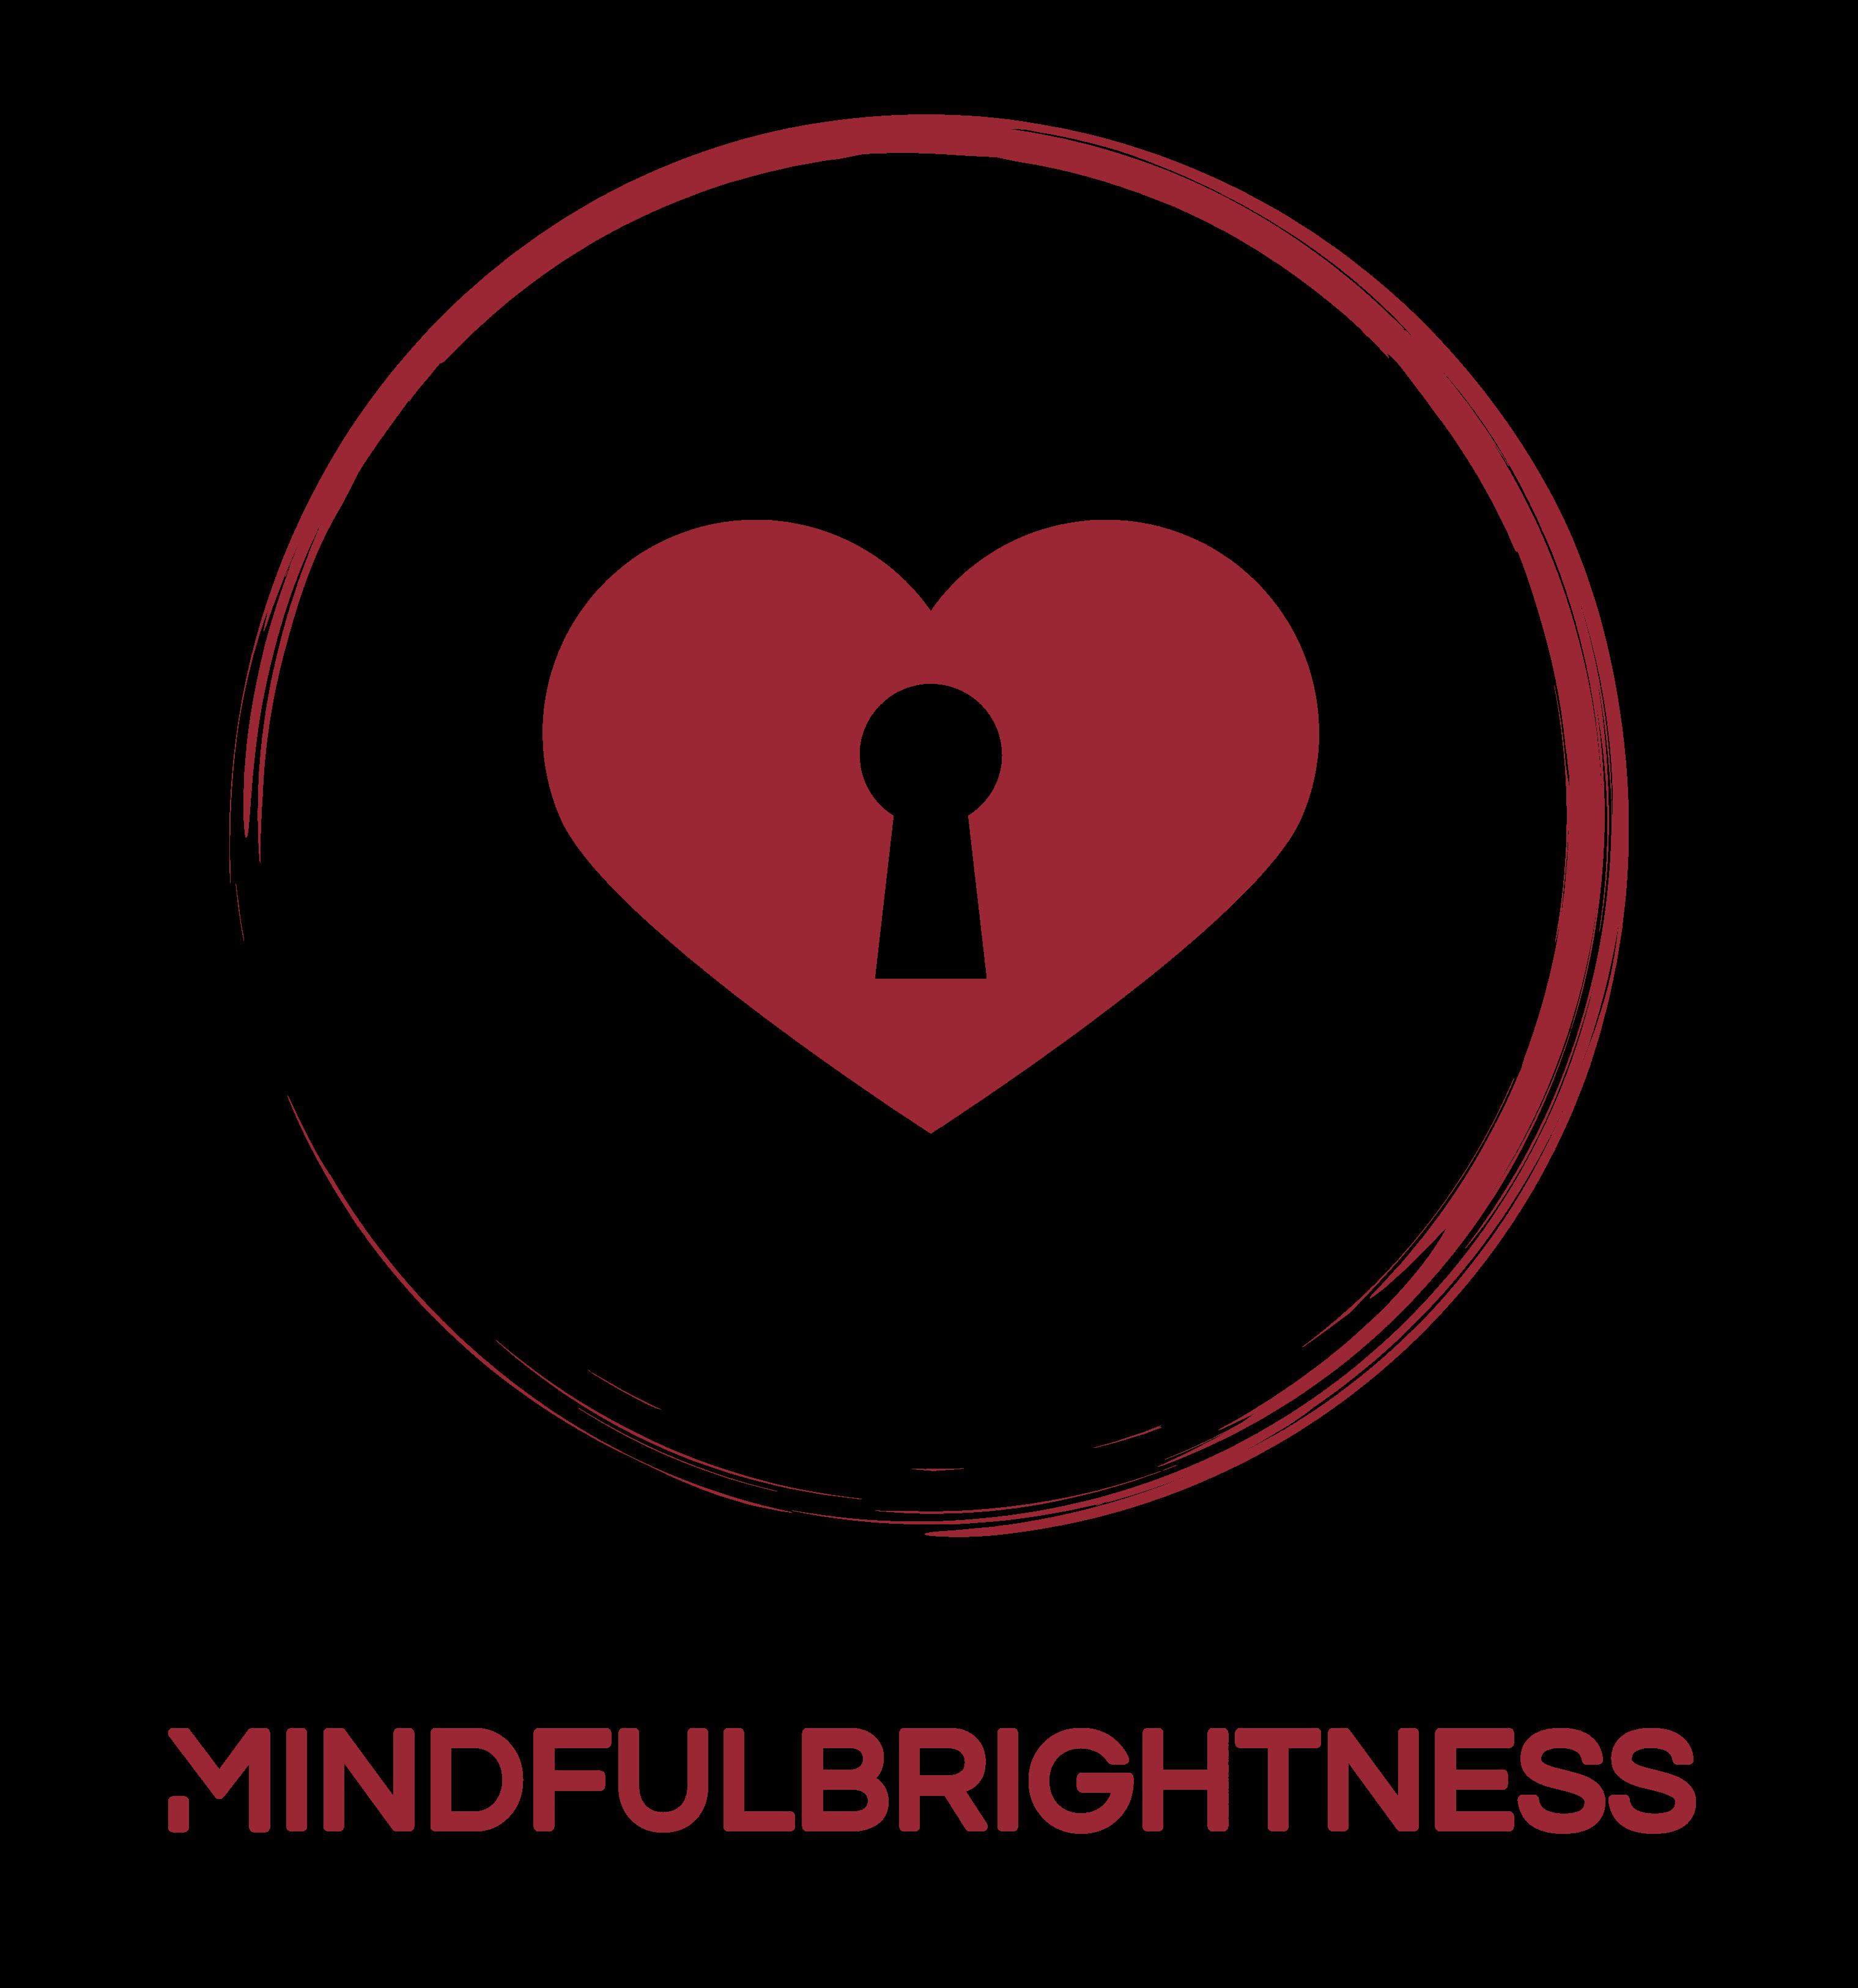 Mindfulbrightness